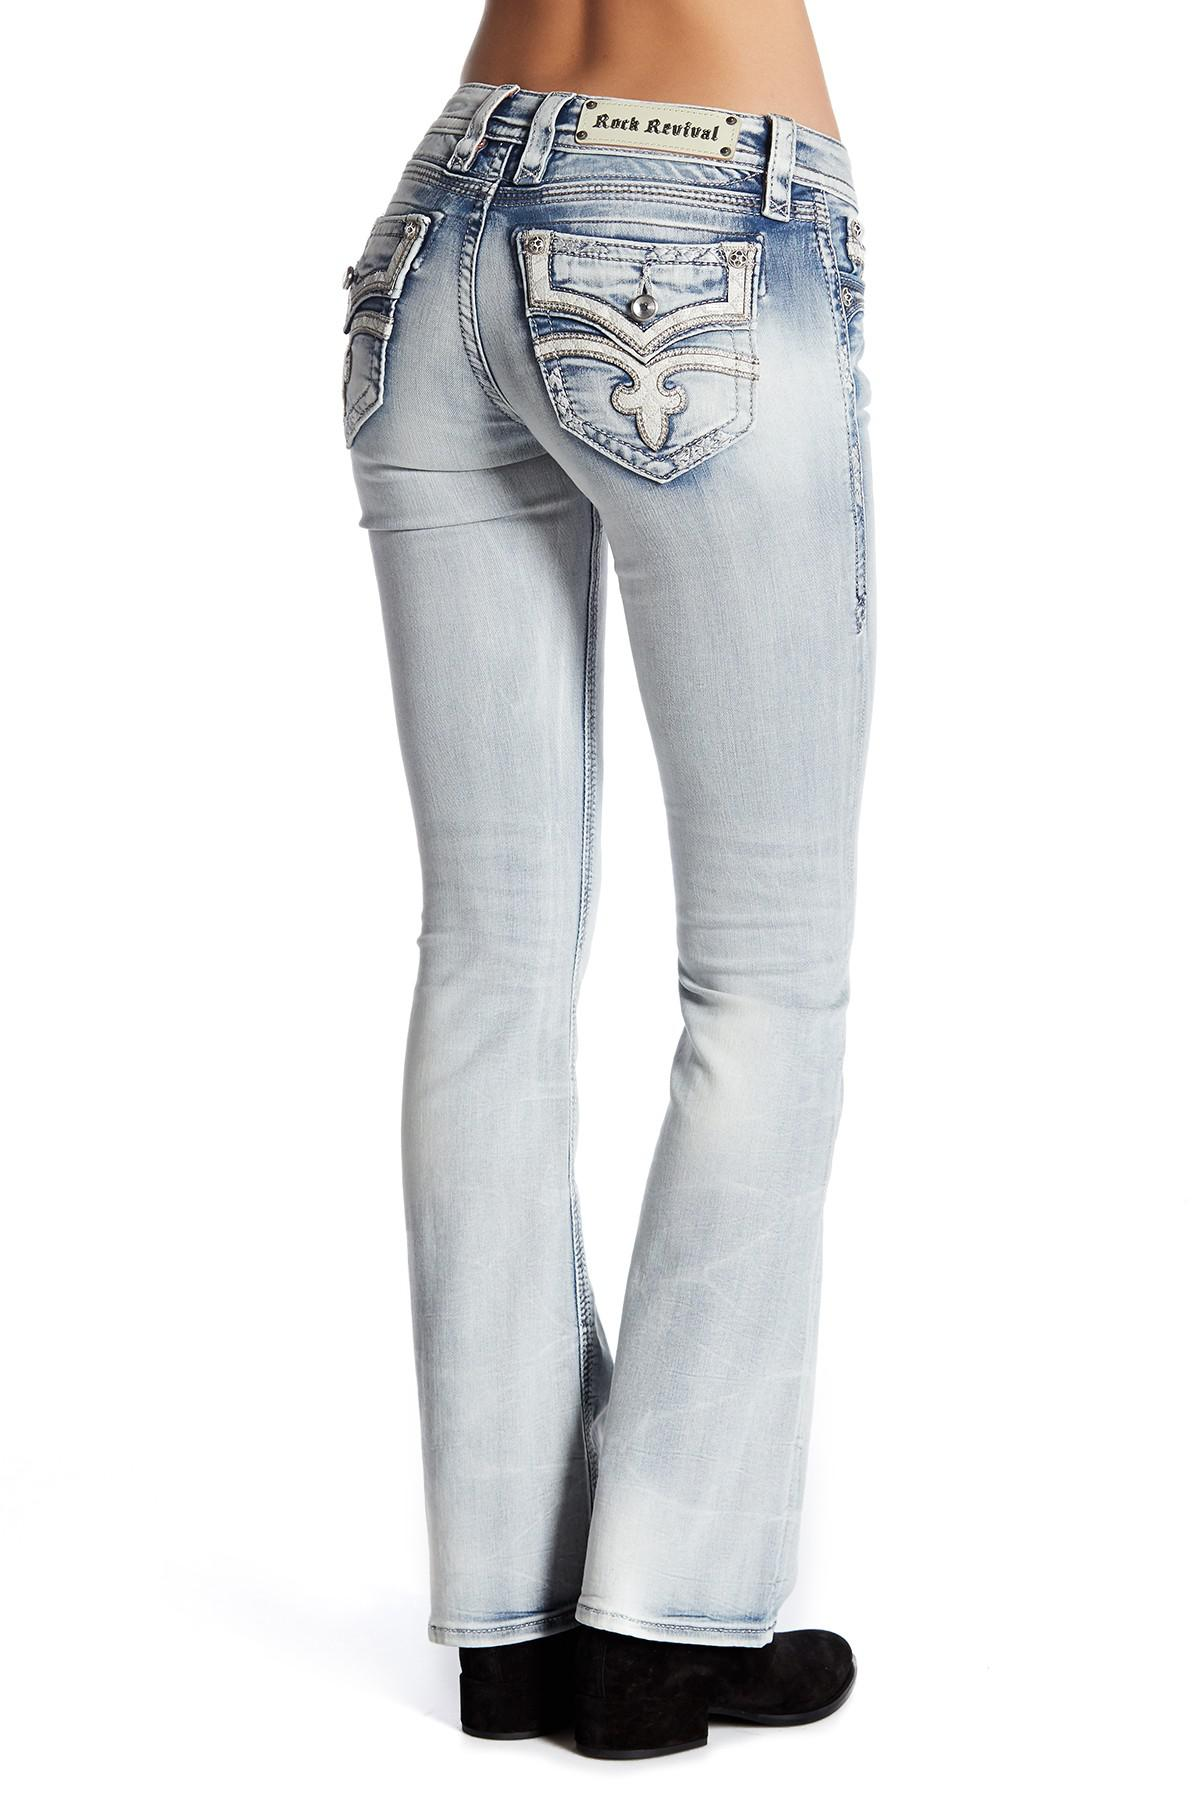 Rock Revival Faded Boot Cut Jeans in Blue - Lyst